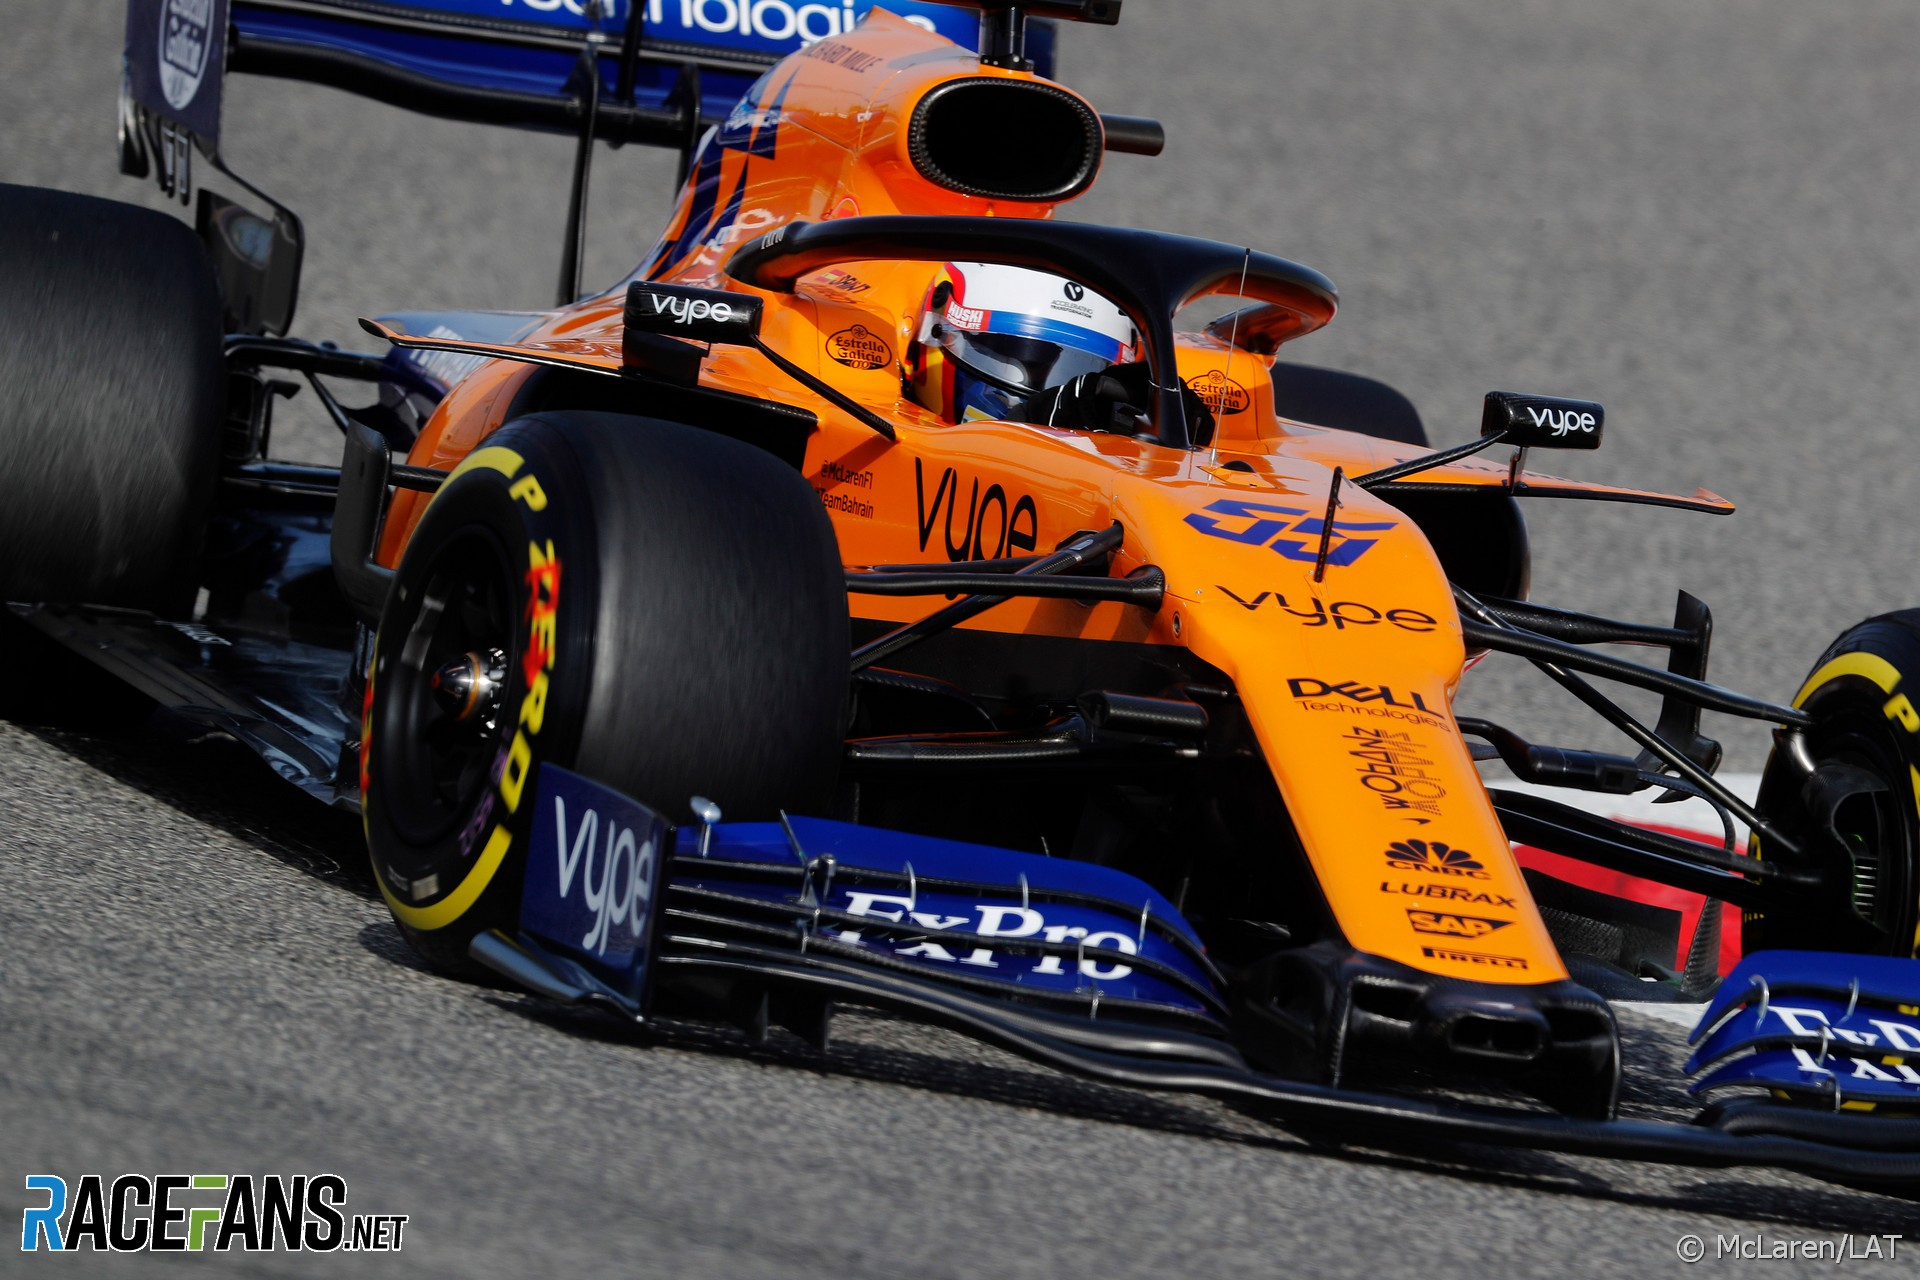 Mclaren F1 Team Not Considering Renault Its First Target Racefans